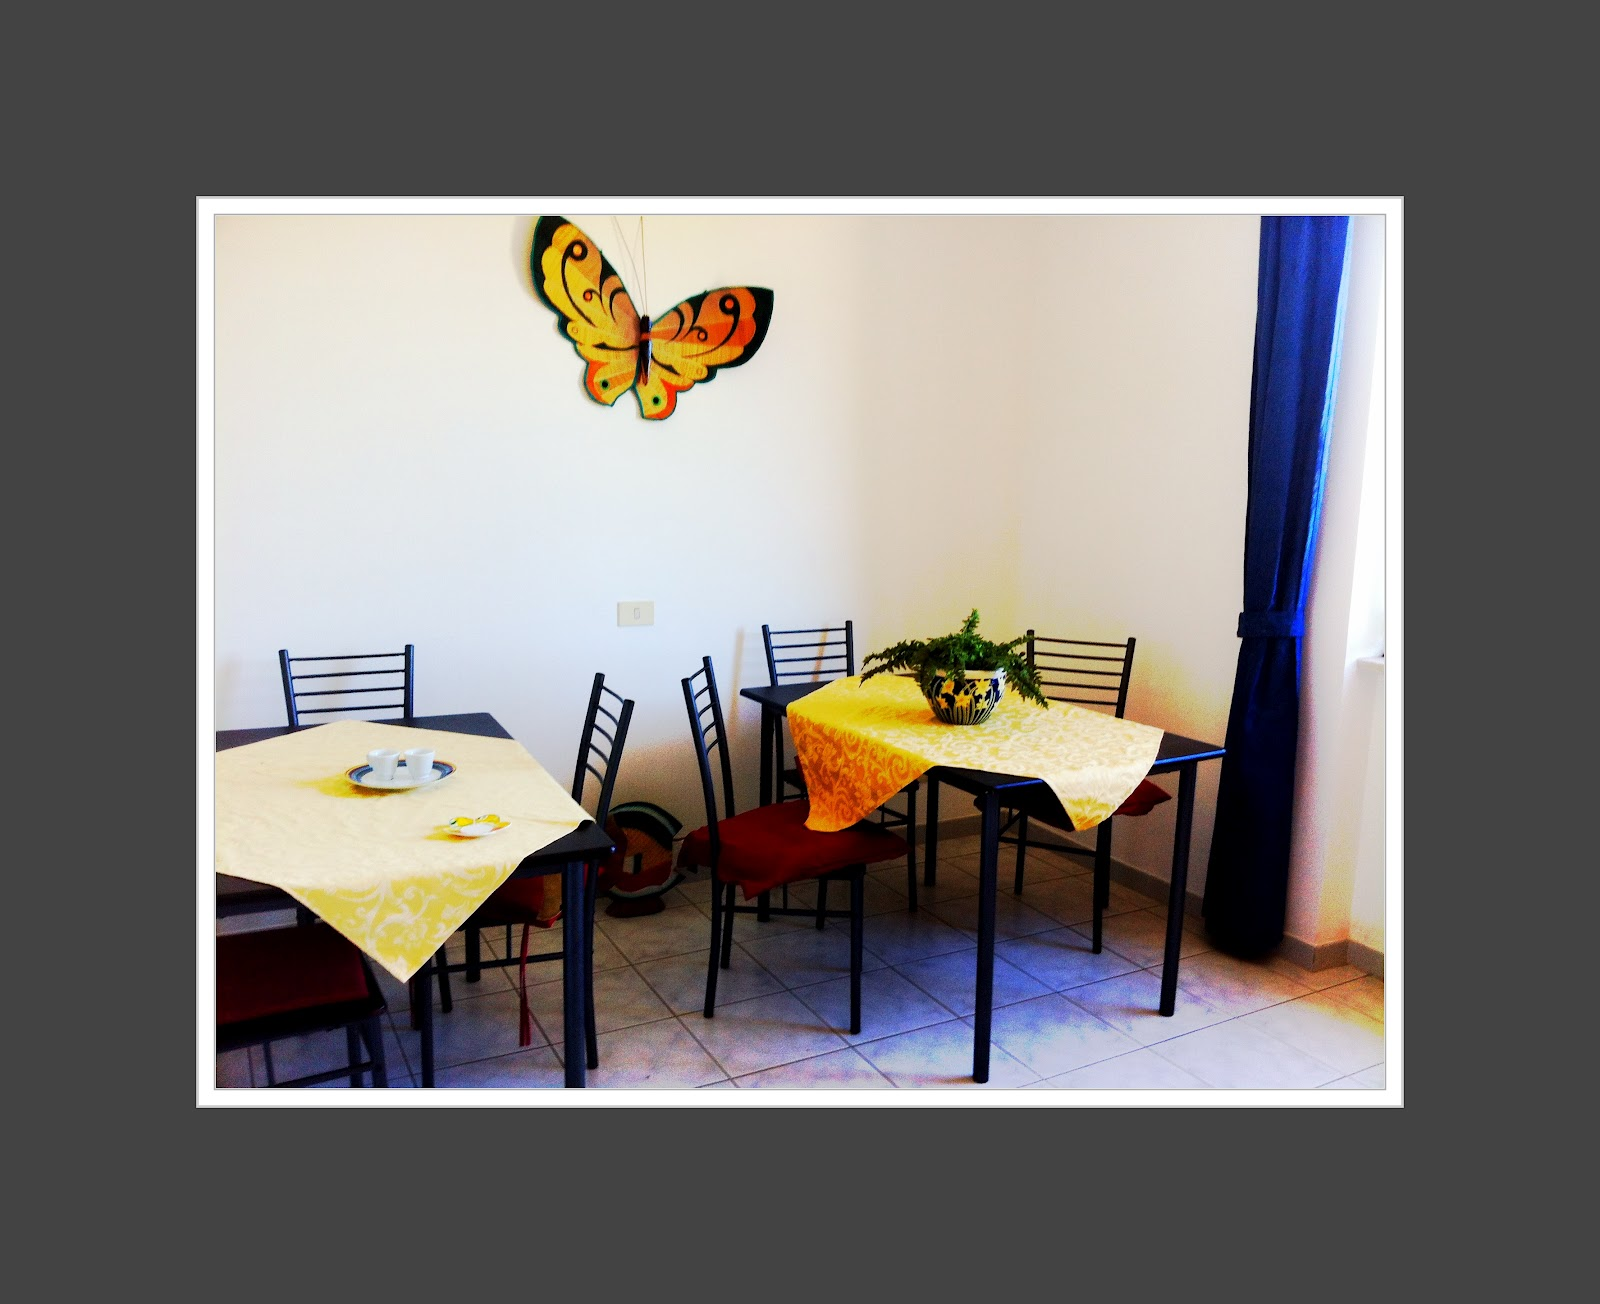 Casa di palma villa stefania ventotene cucina con for Cucina con sala da pranzo